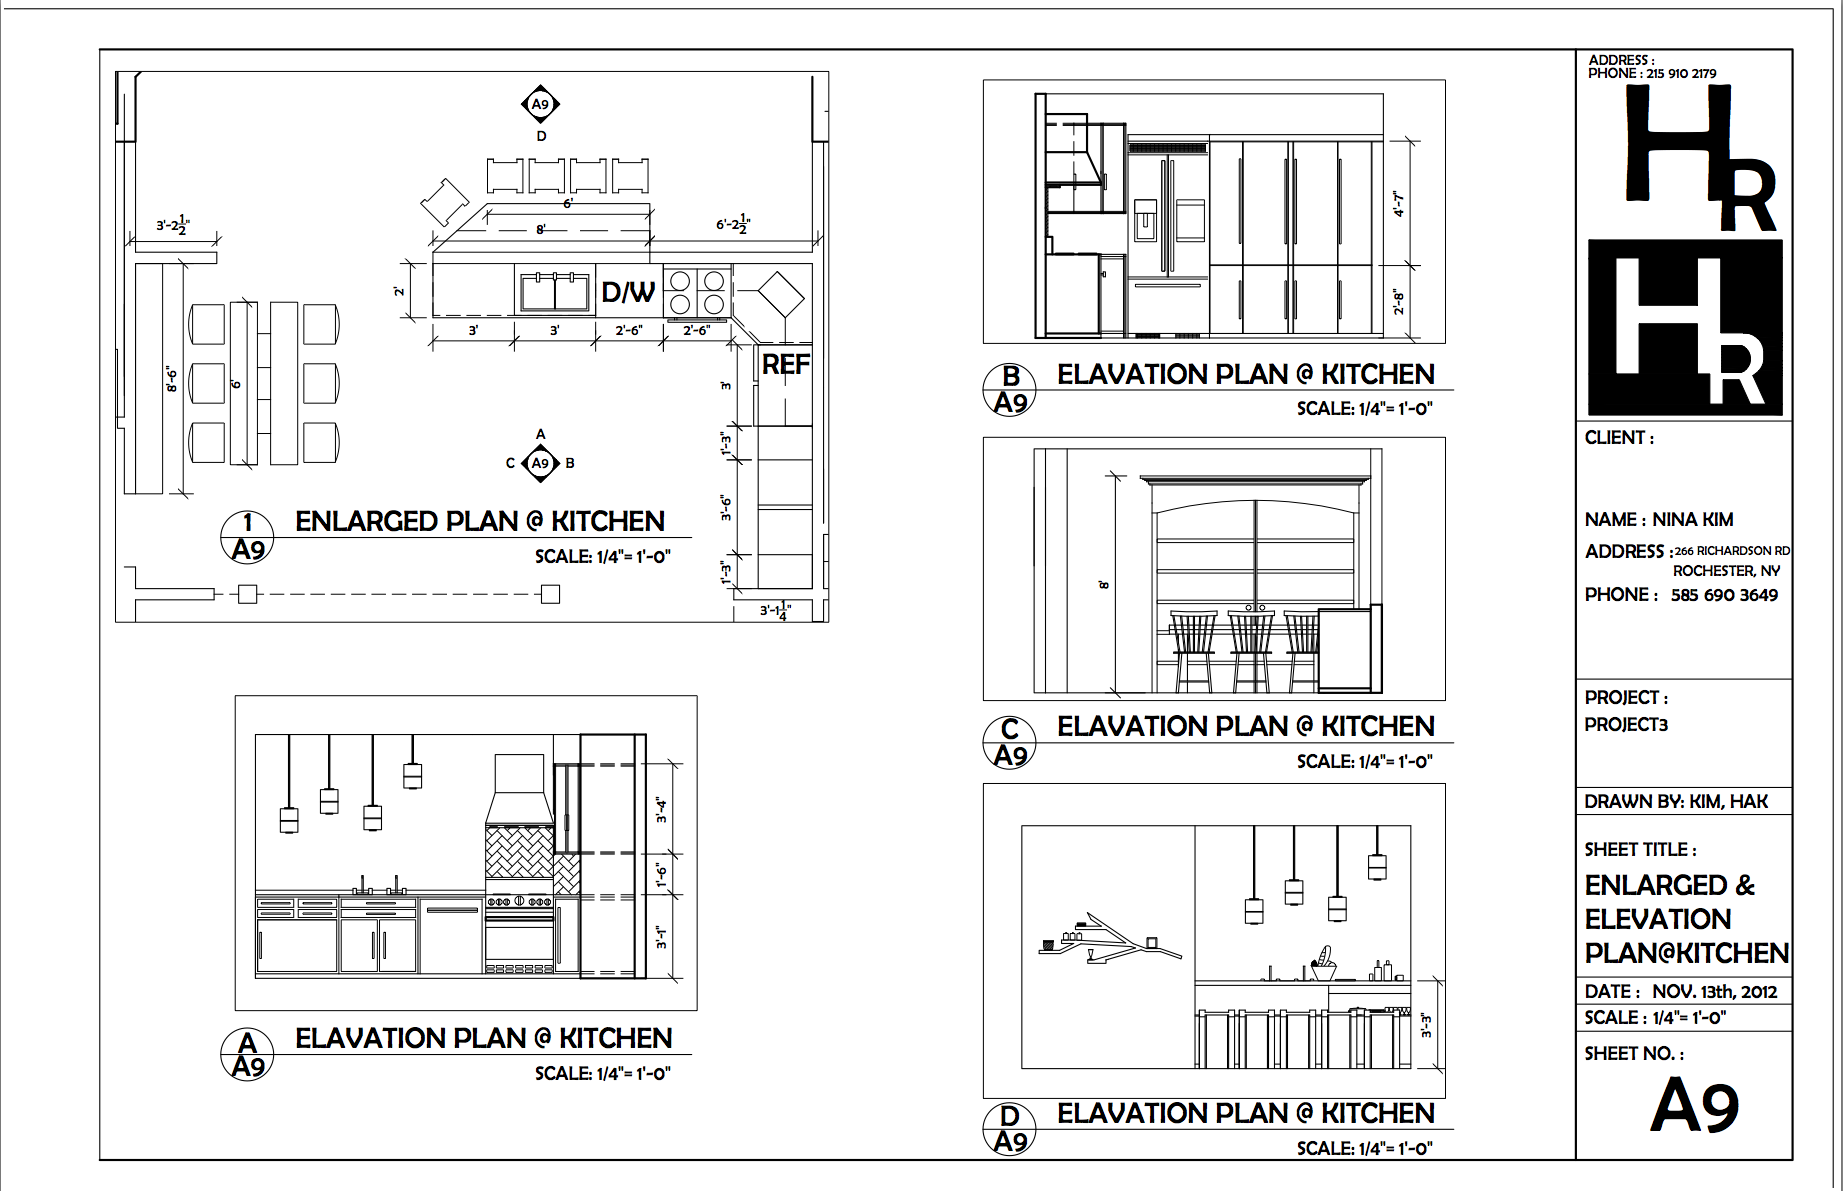 medium resolution of kitchen enlarged and elevation plan elevation plan autocad floor plans house floor plans